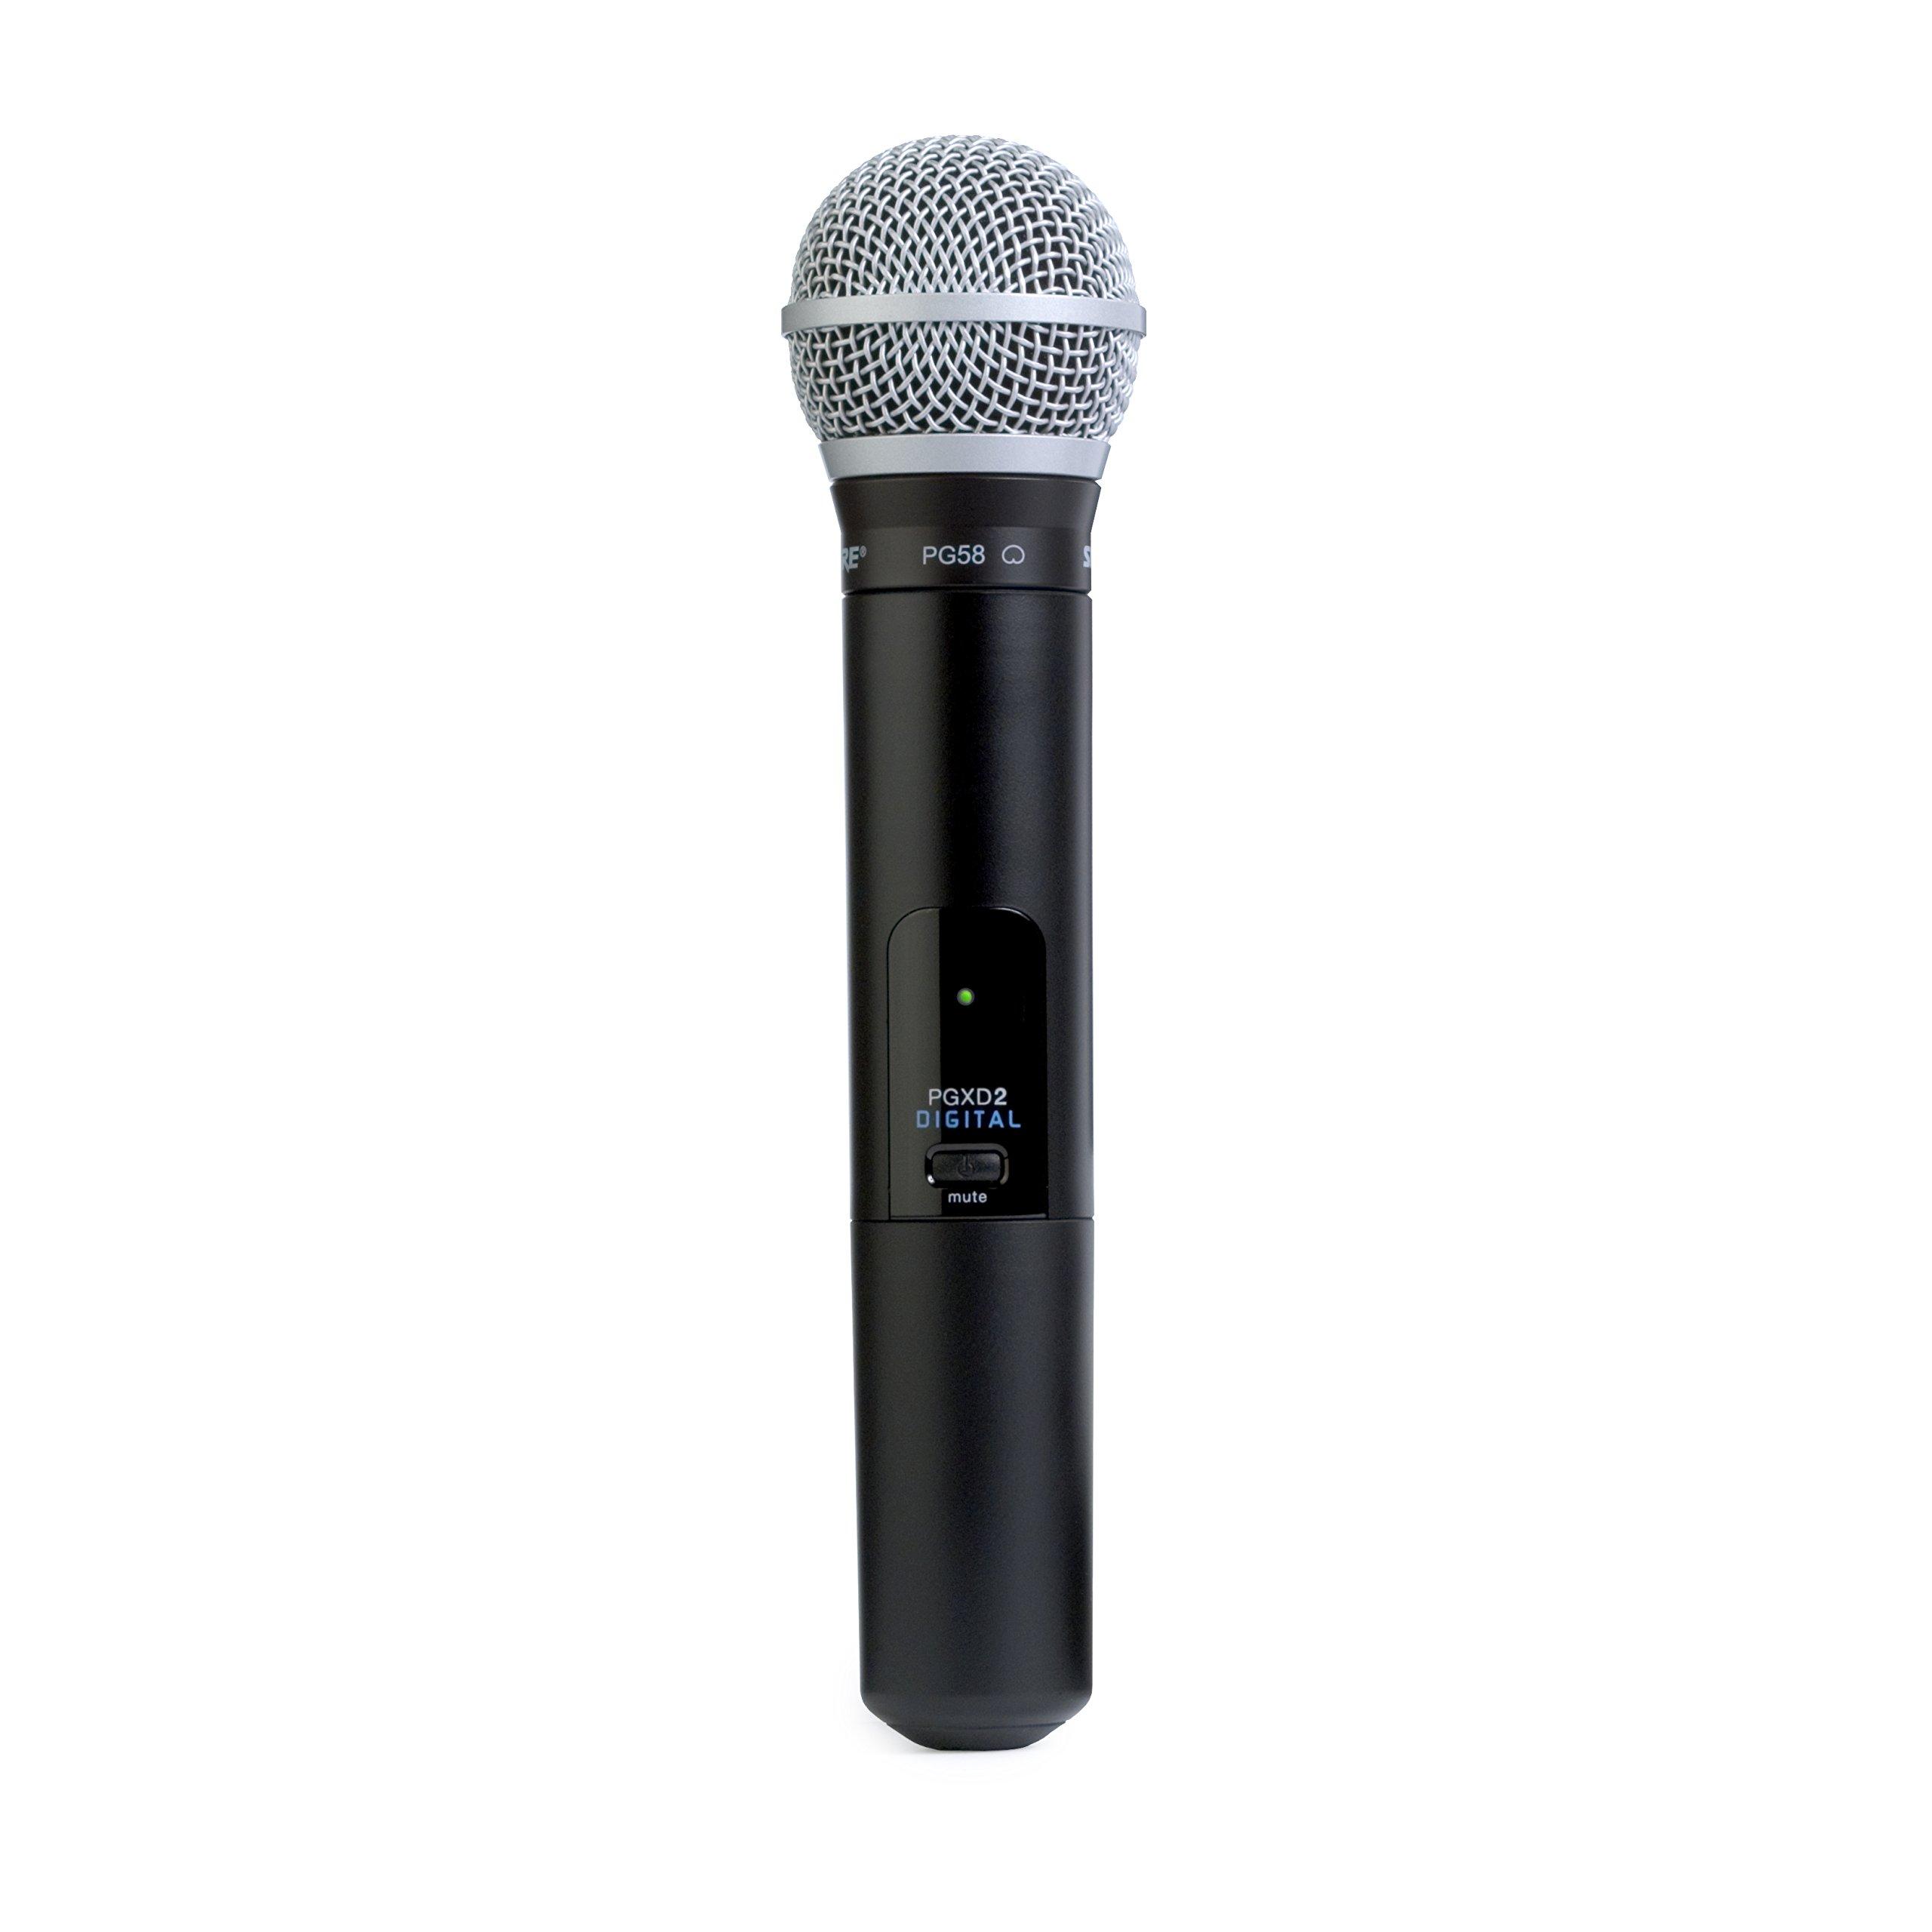 Microfono Shure PGXD2/PG58=-X8 Digital Handheld Wireless ...